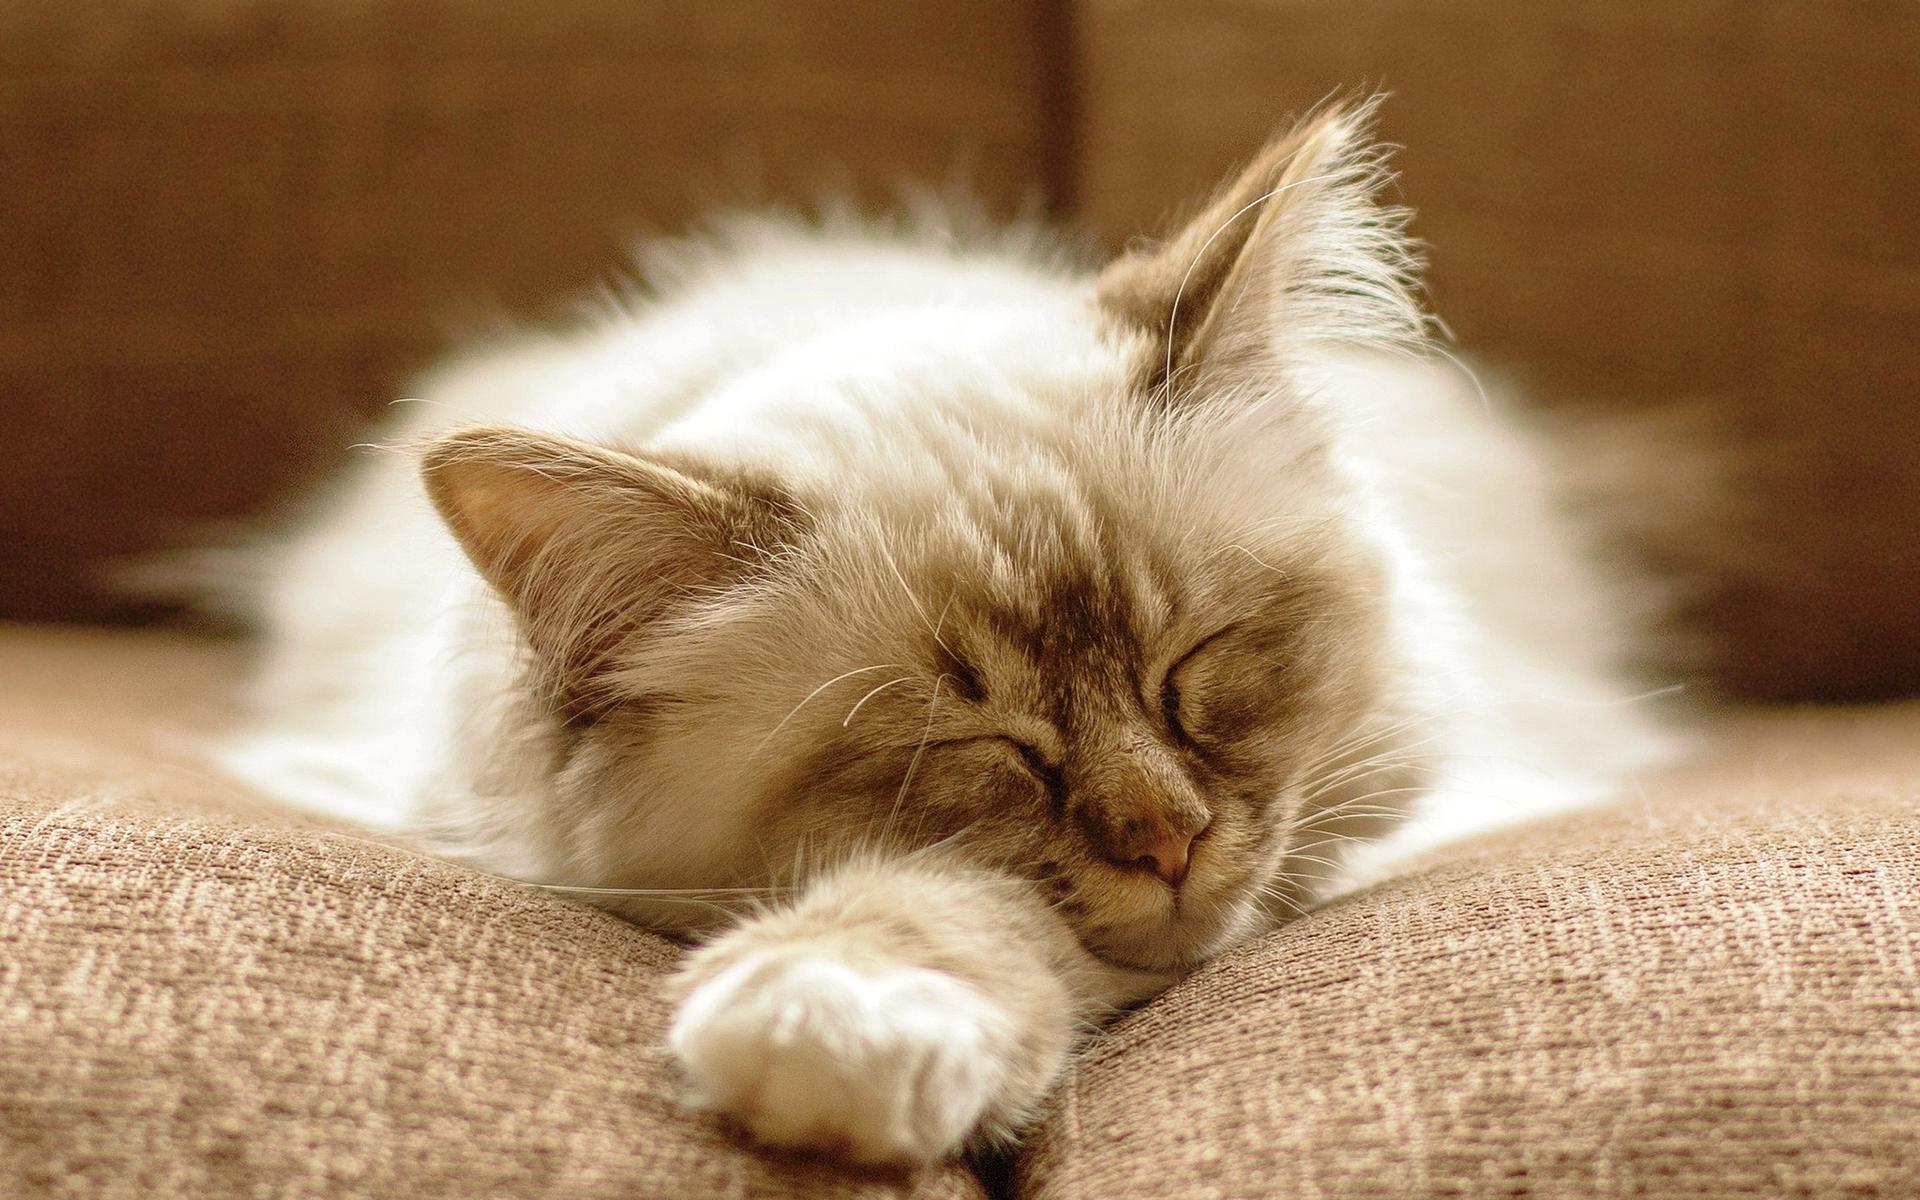 Fluffy Cat Images Hd Desktop Wallpapers 4k Hd